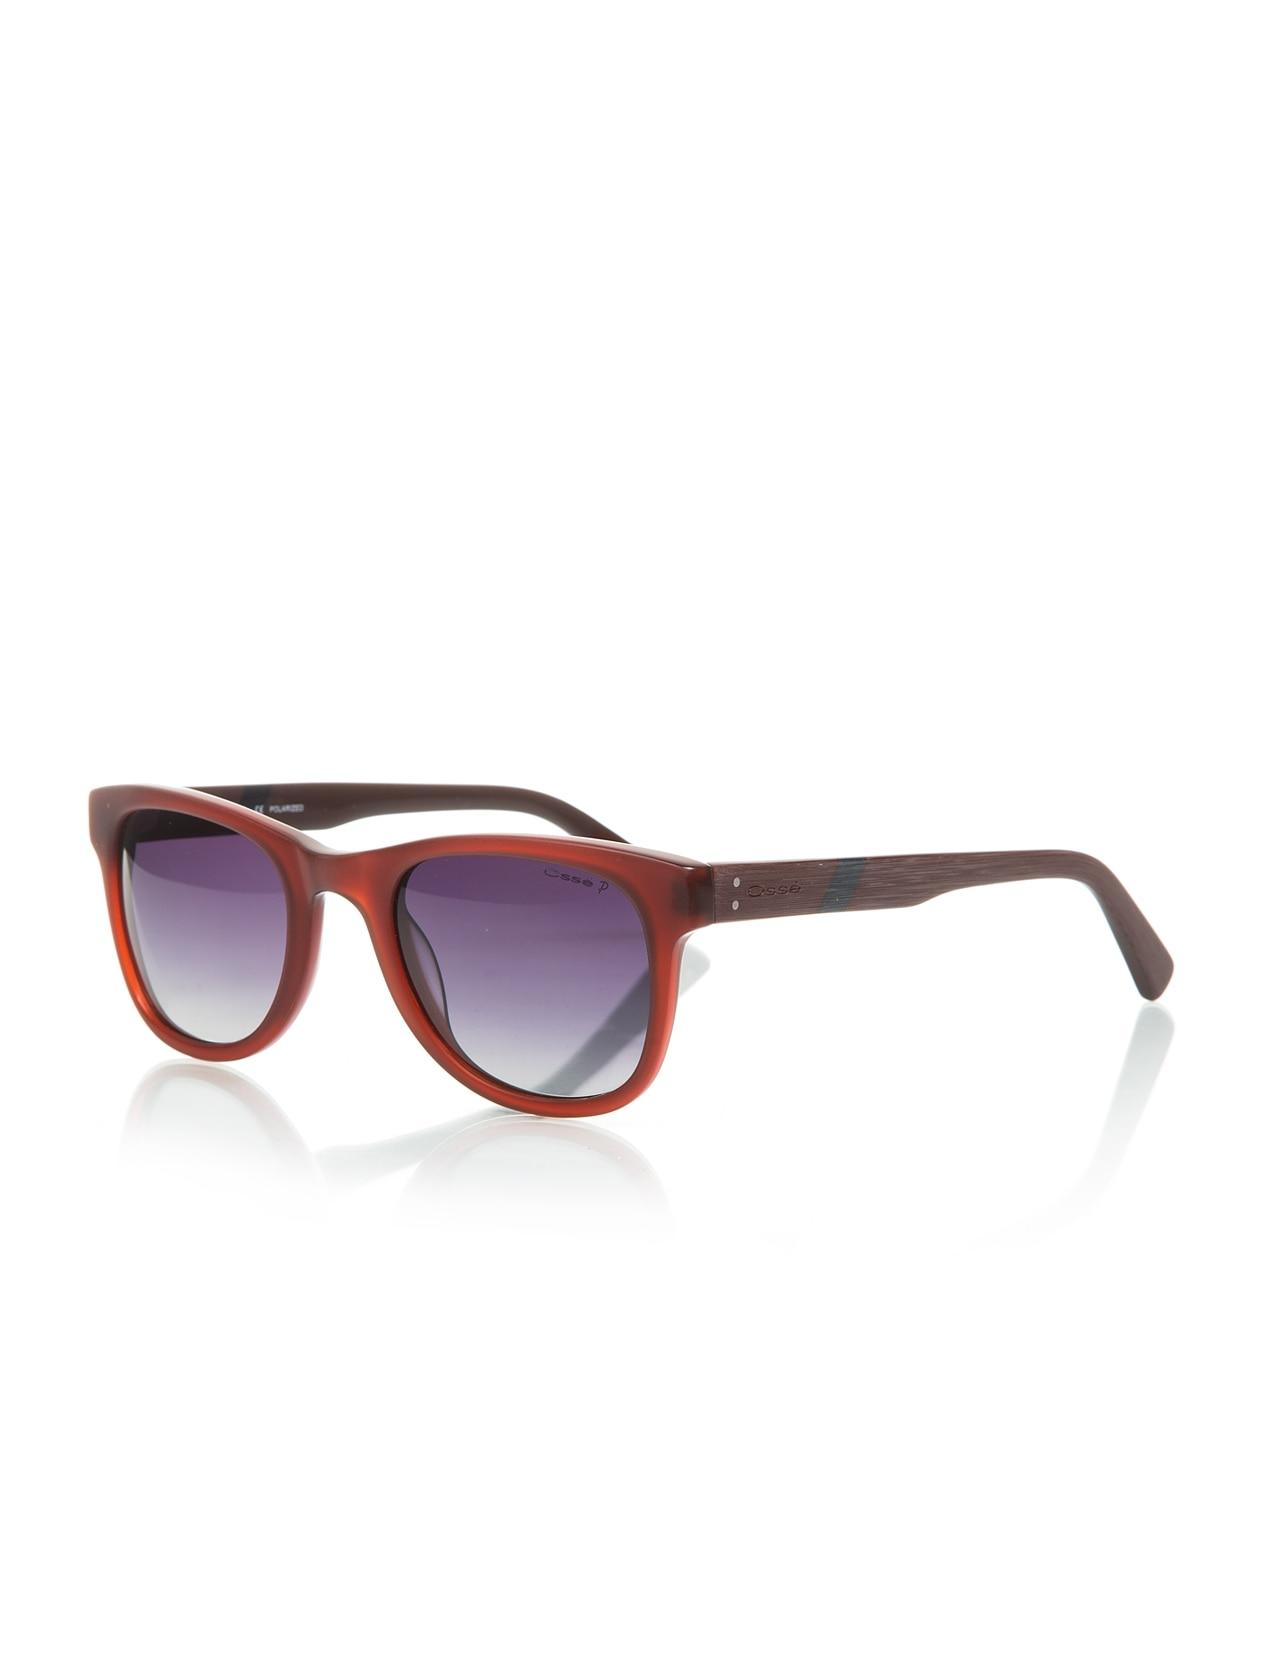 Unisex sunglasses os 2022 03 bone Burgundy organic square square 51-23-145 osse